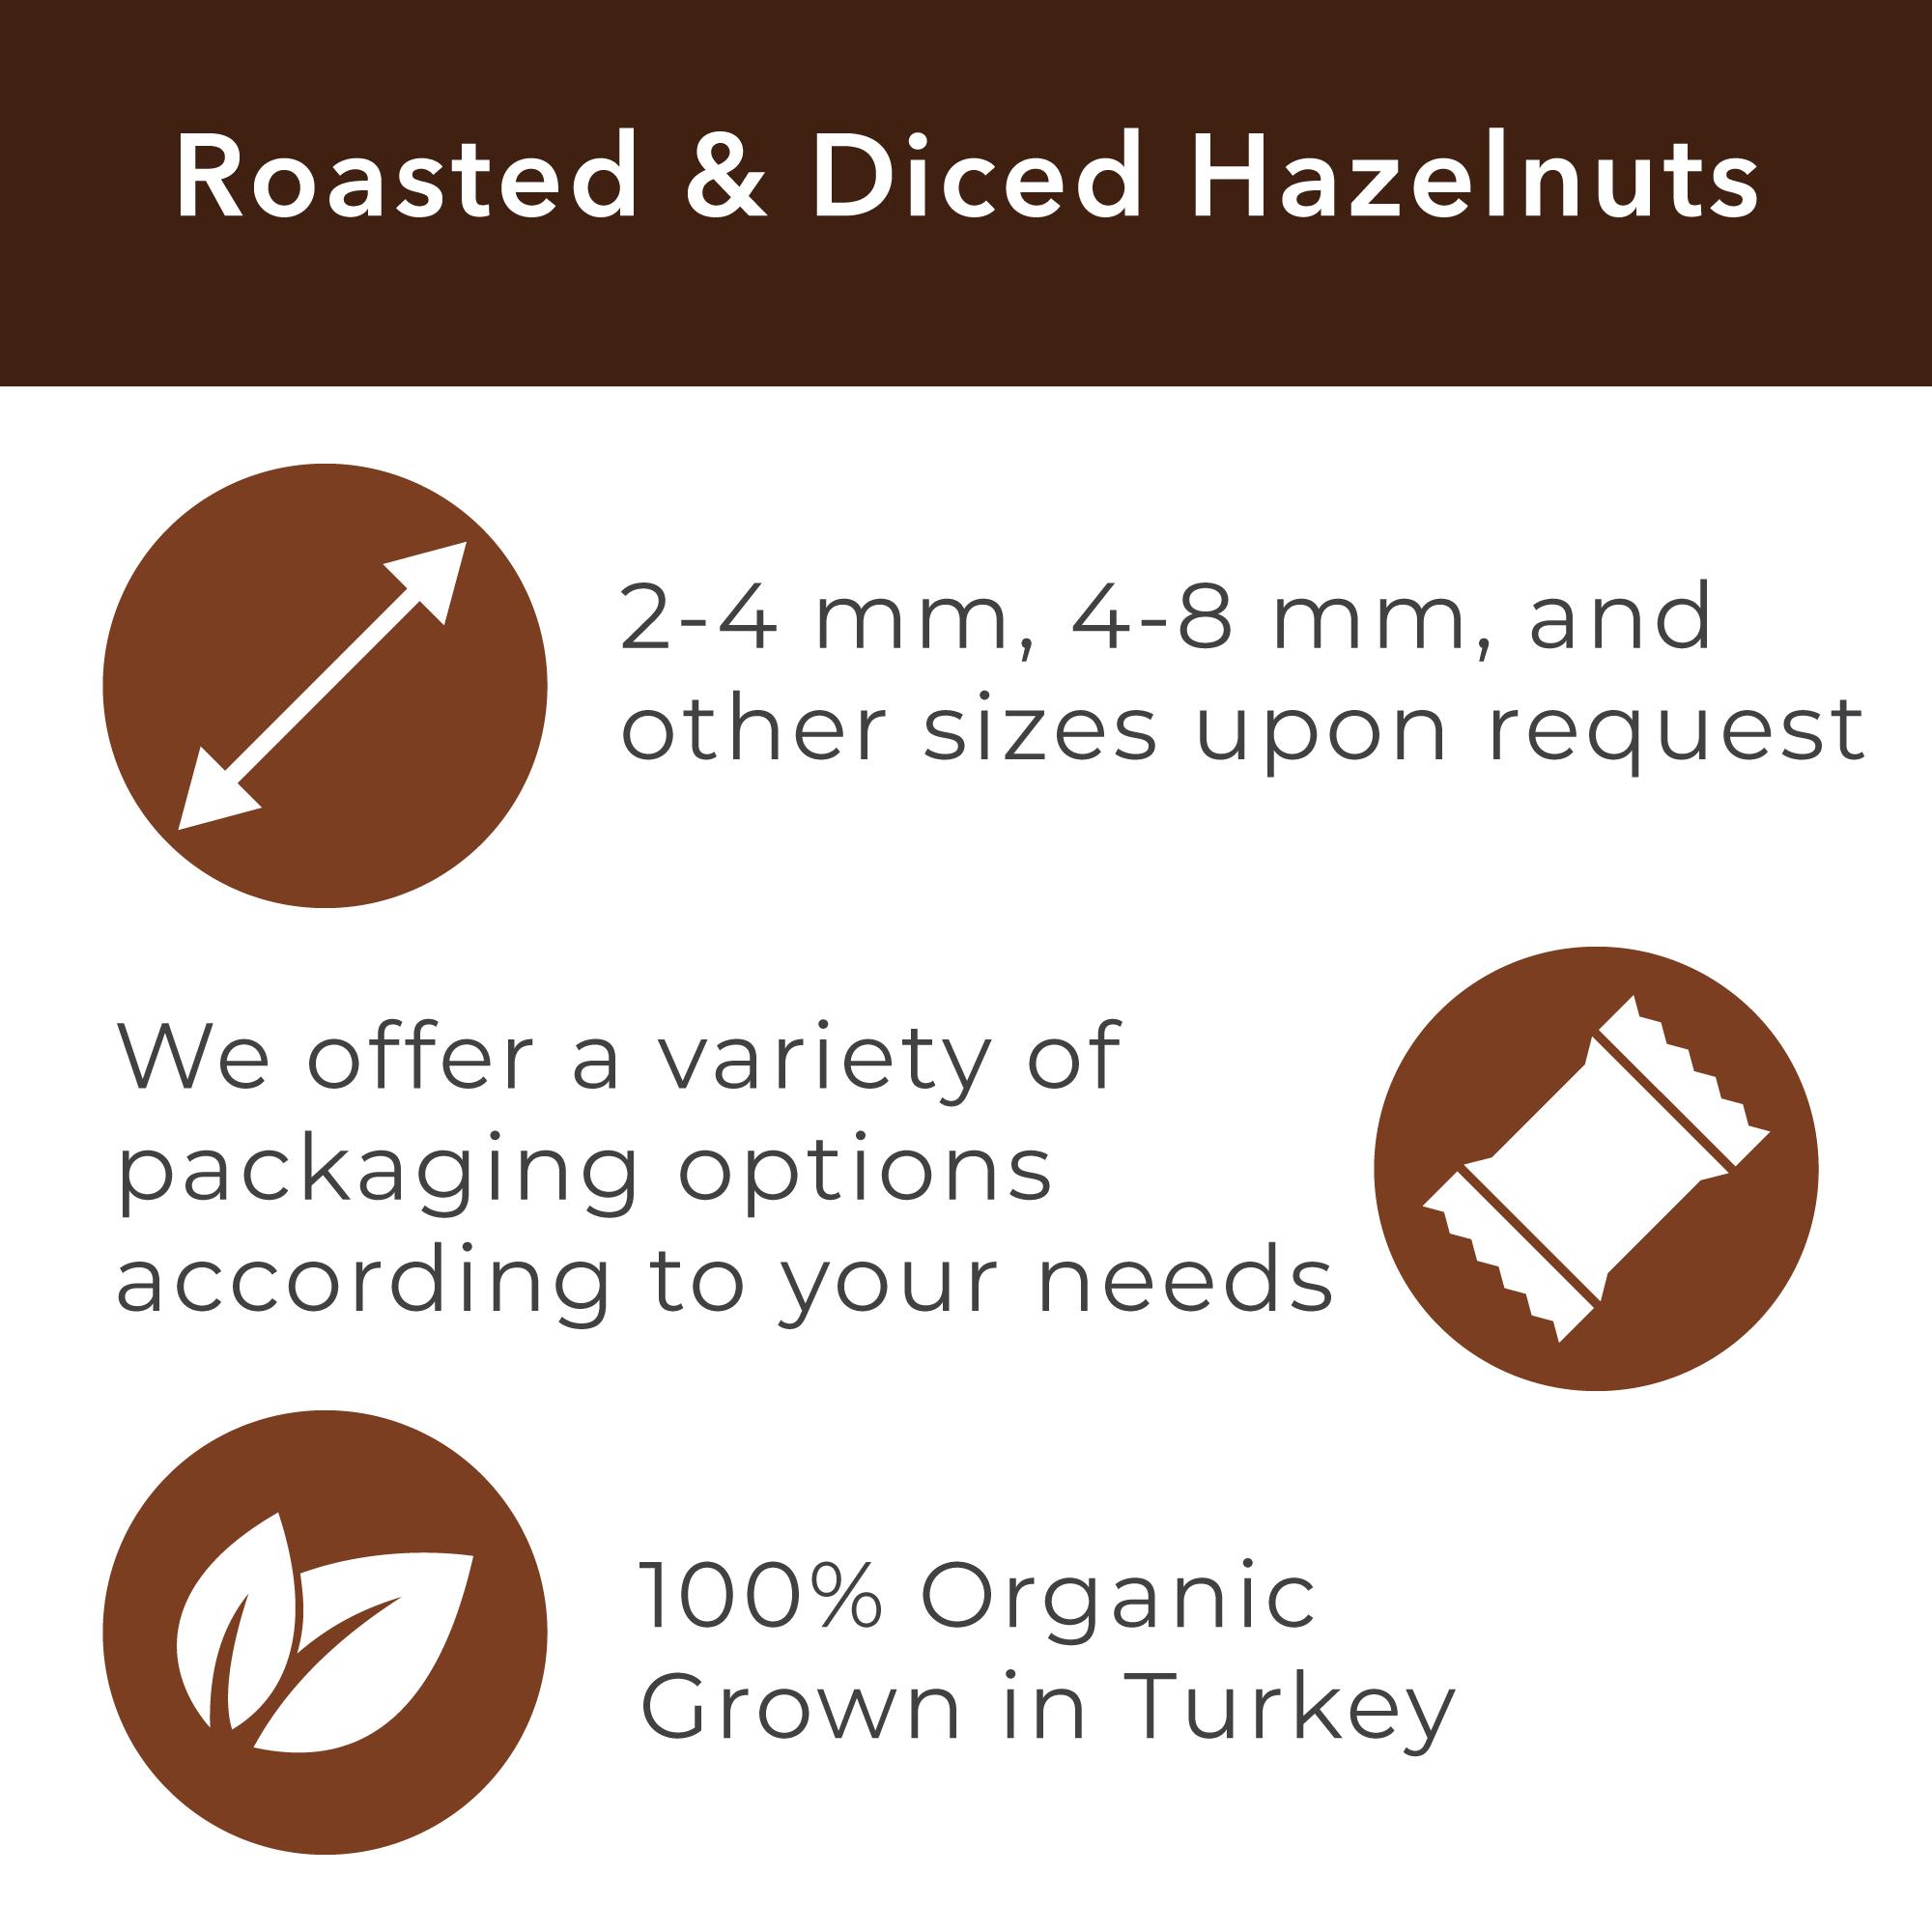 jason-b-graham-roasted-diced-hazelnuts-67341b